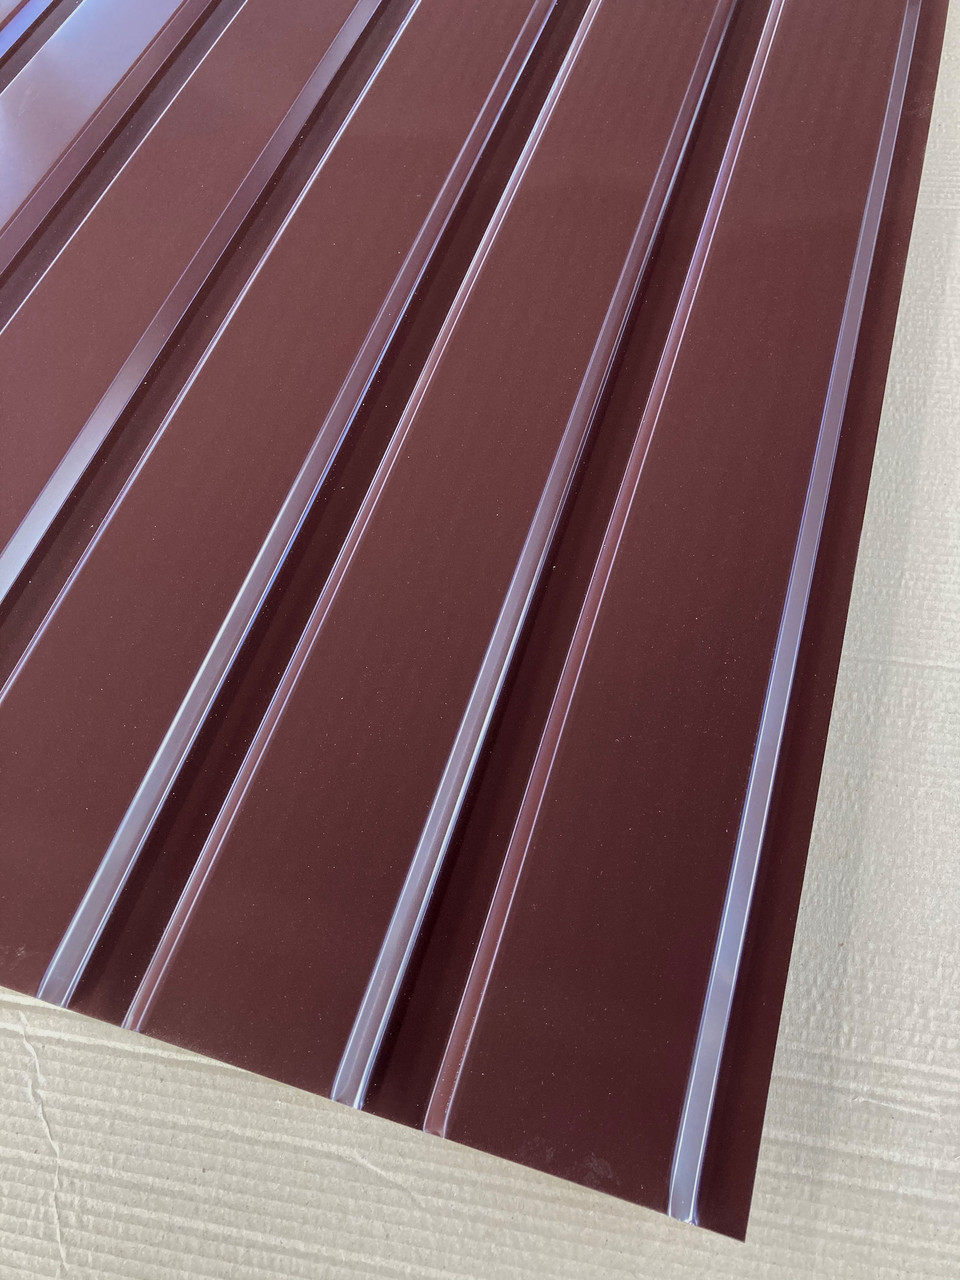 Профнастил для забора шоколад ПС-20, 0,45 мм; высота 1.75 метра ширина 1,16 м